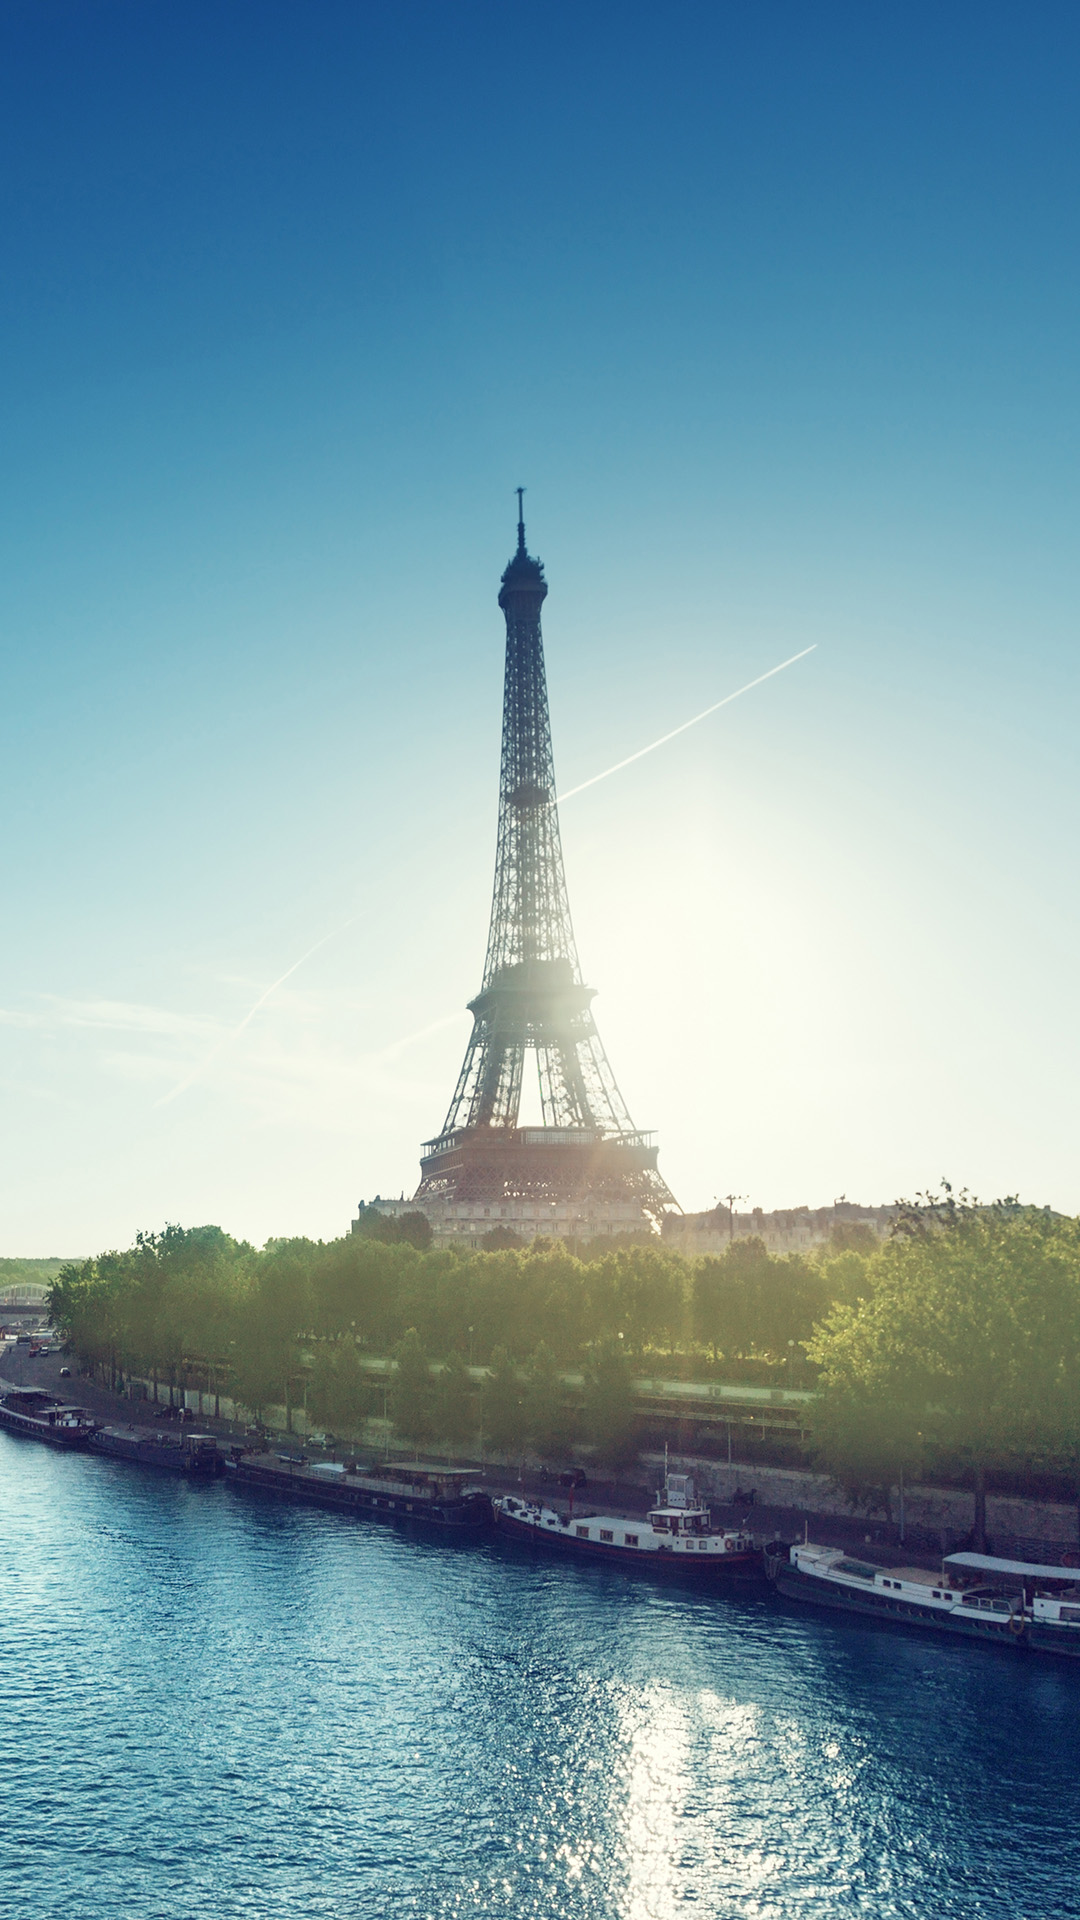 Very beautiful Eiffel Tower iphone 6 plus wallpaper iPhone 6 Plus 1080x1920